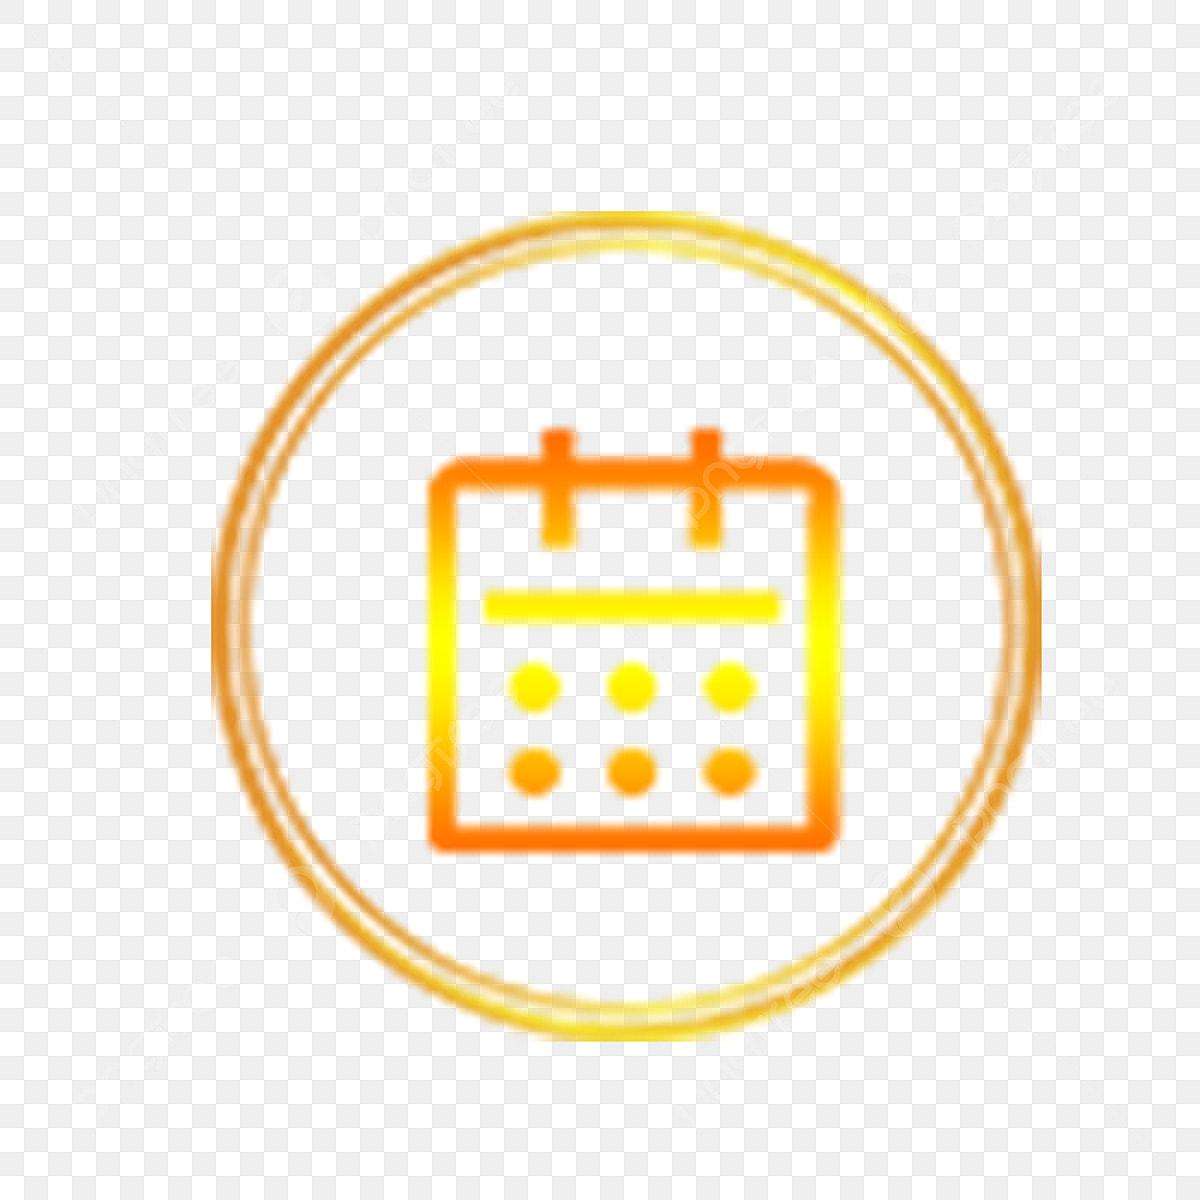 Google Image Result For Https Png Pngtree Com Png Clipart 20190903 Original Pngtree Cartoon Calendar Icon Download Pn In 2020 Calendar Icon Clip Art Sport Team Logos